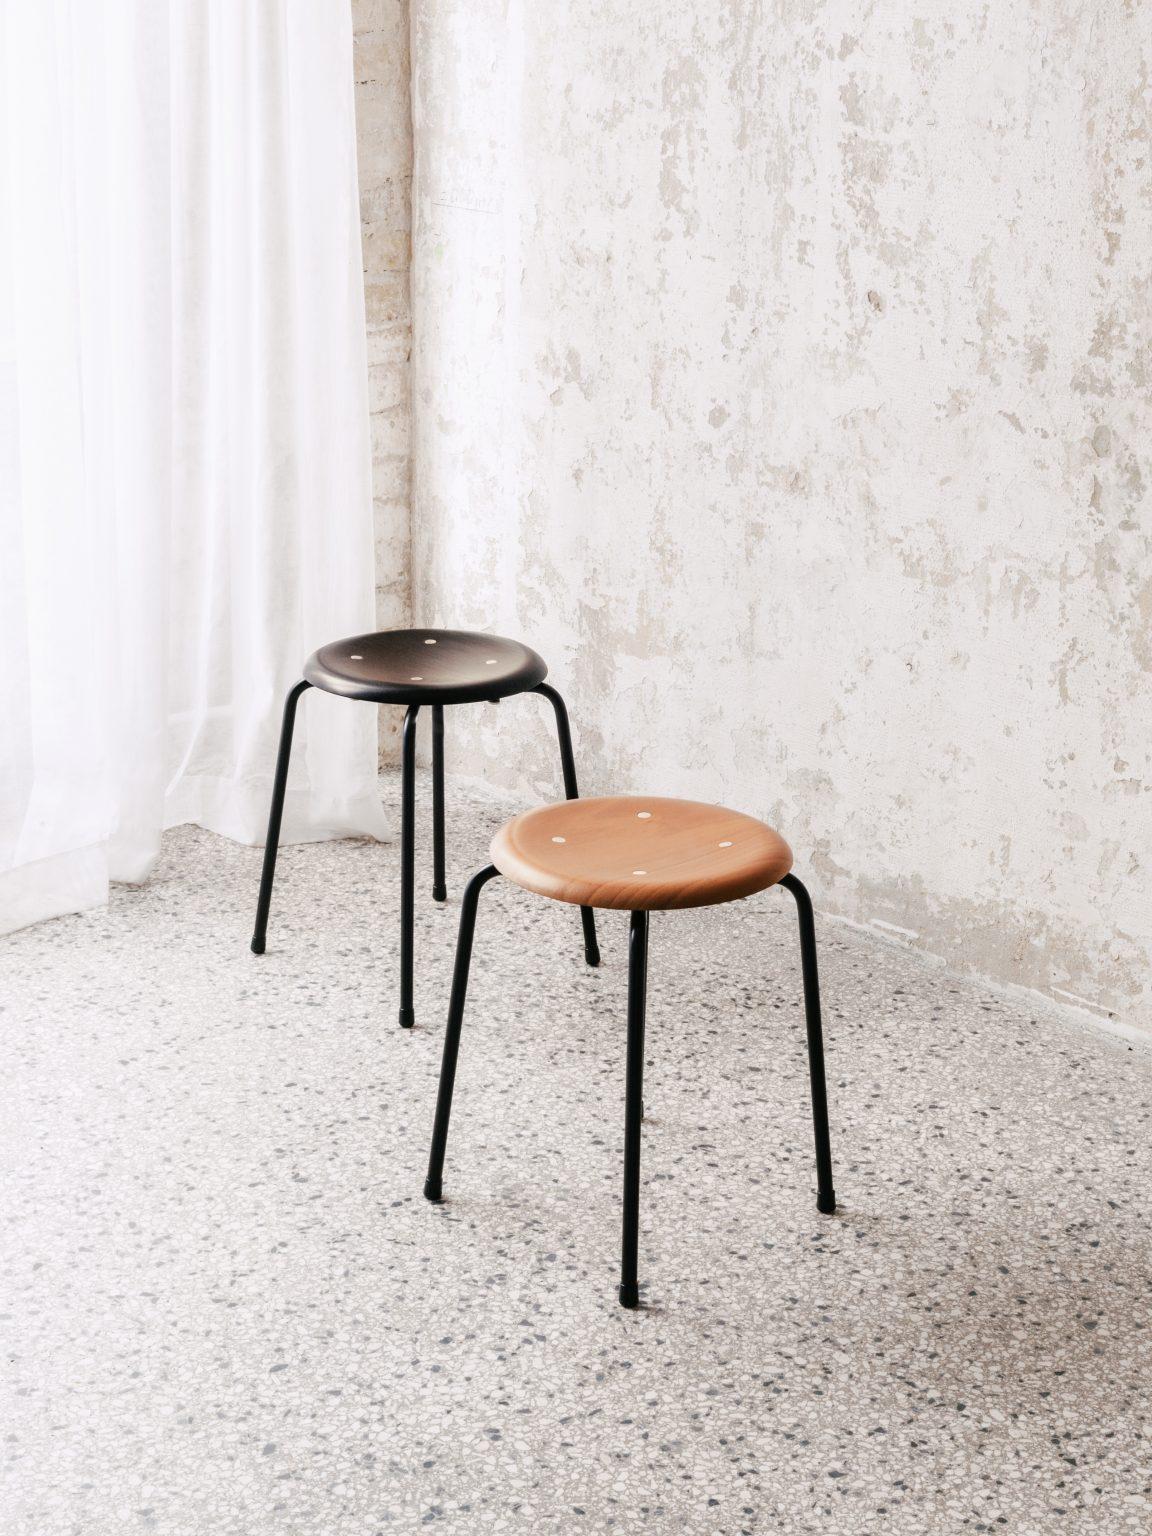 Biennale Interieur - Belgium's leading design and interior event - Wildespieth-s38s1-ensemble-black-beech.jpg